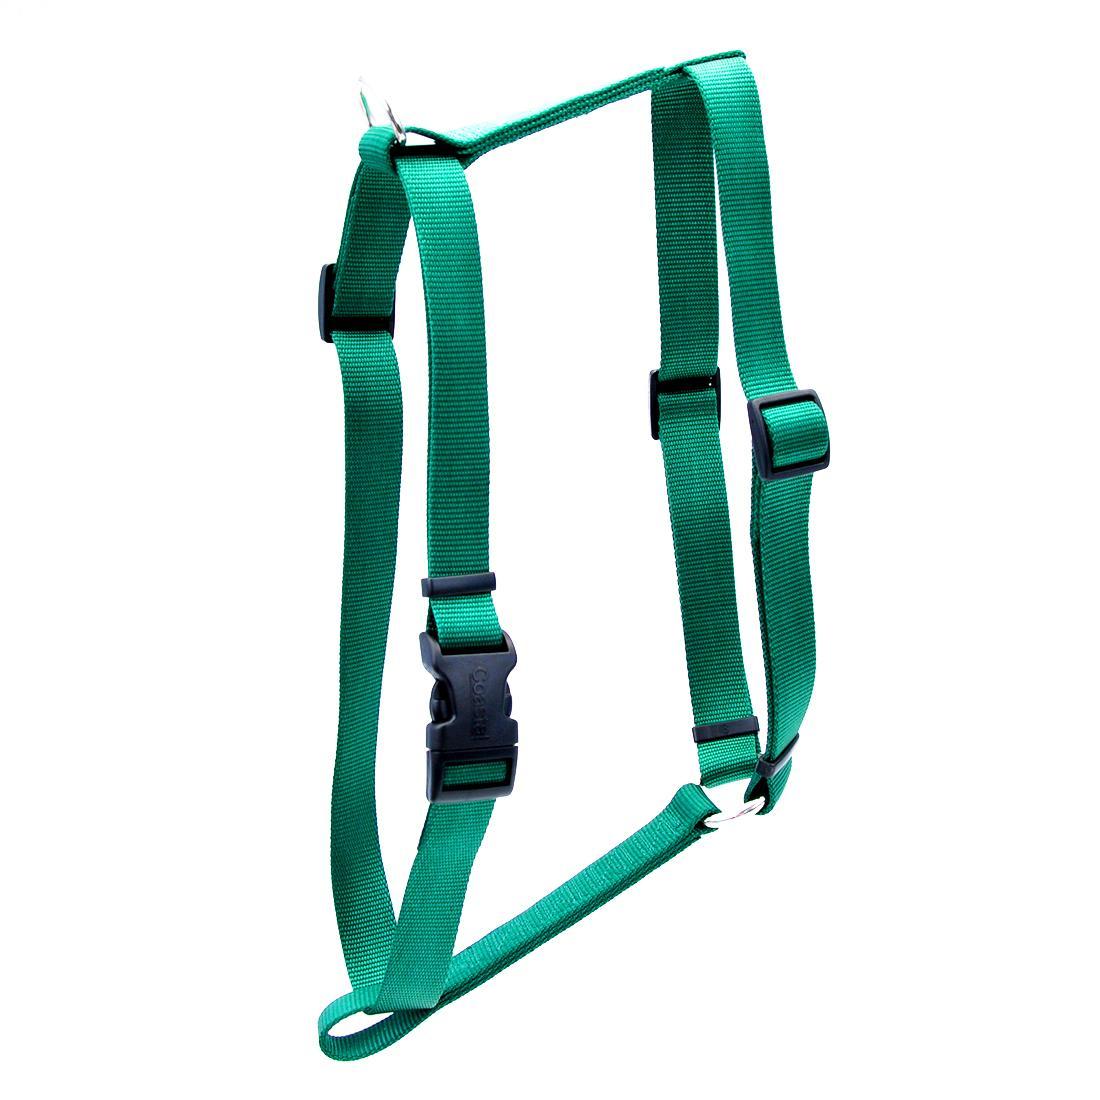 Coastal Standard Adjustable Dog Harness, Hunter, 3/8-in x 10-18-in